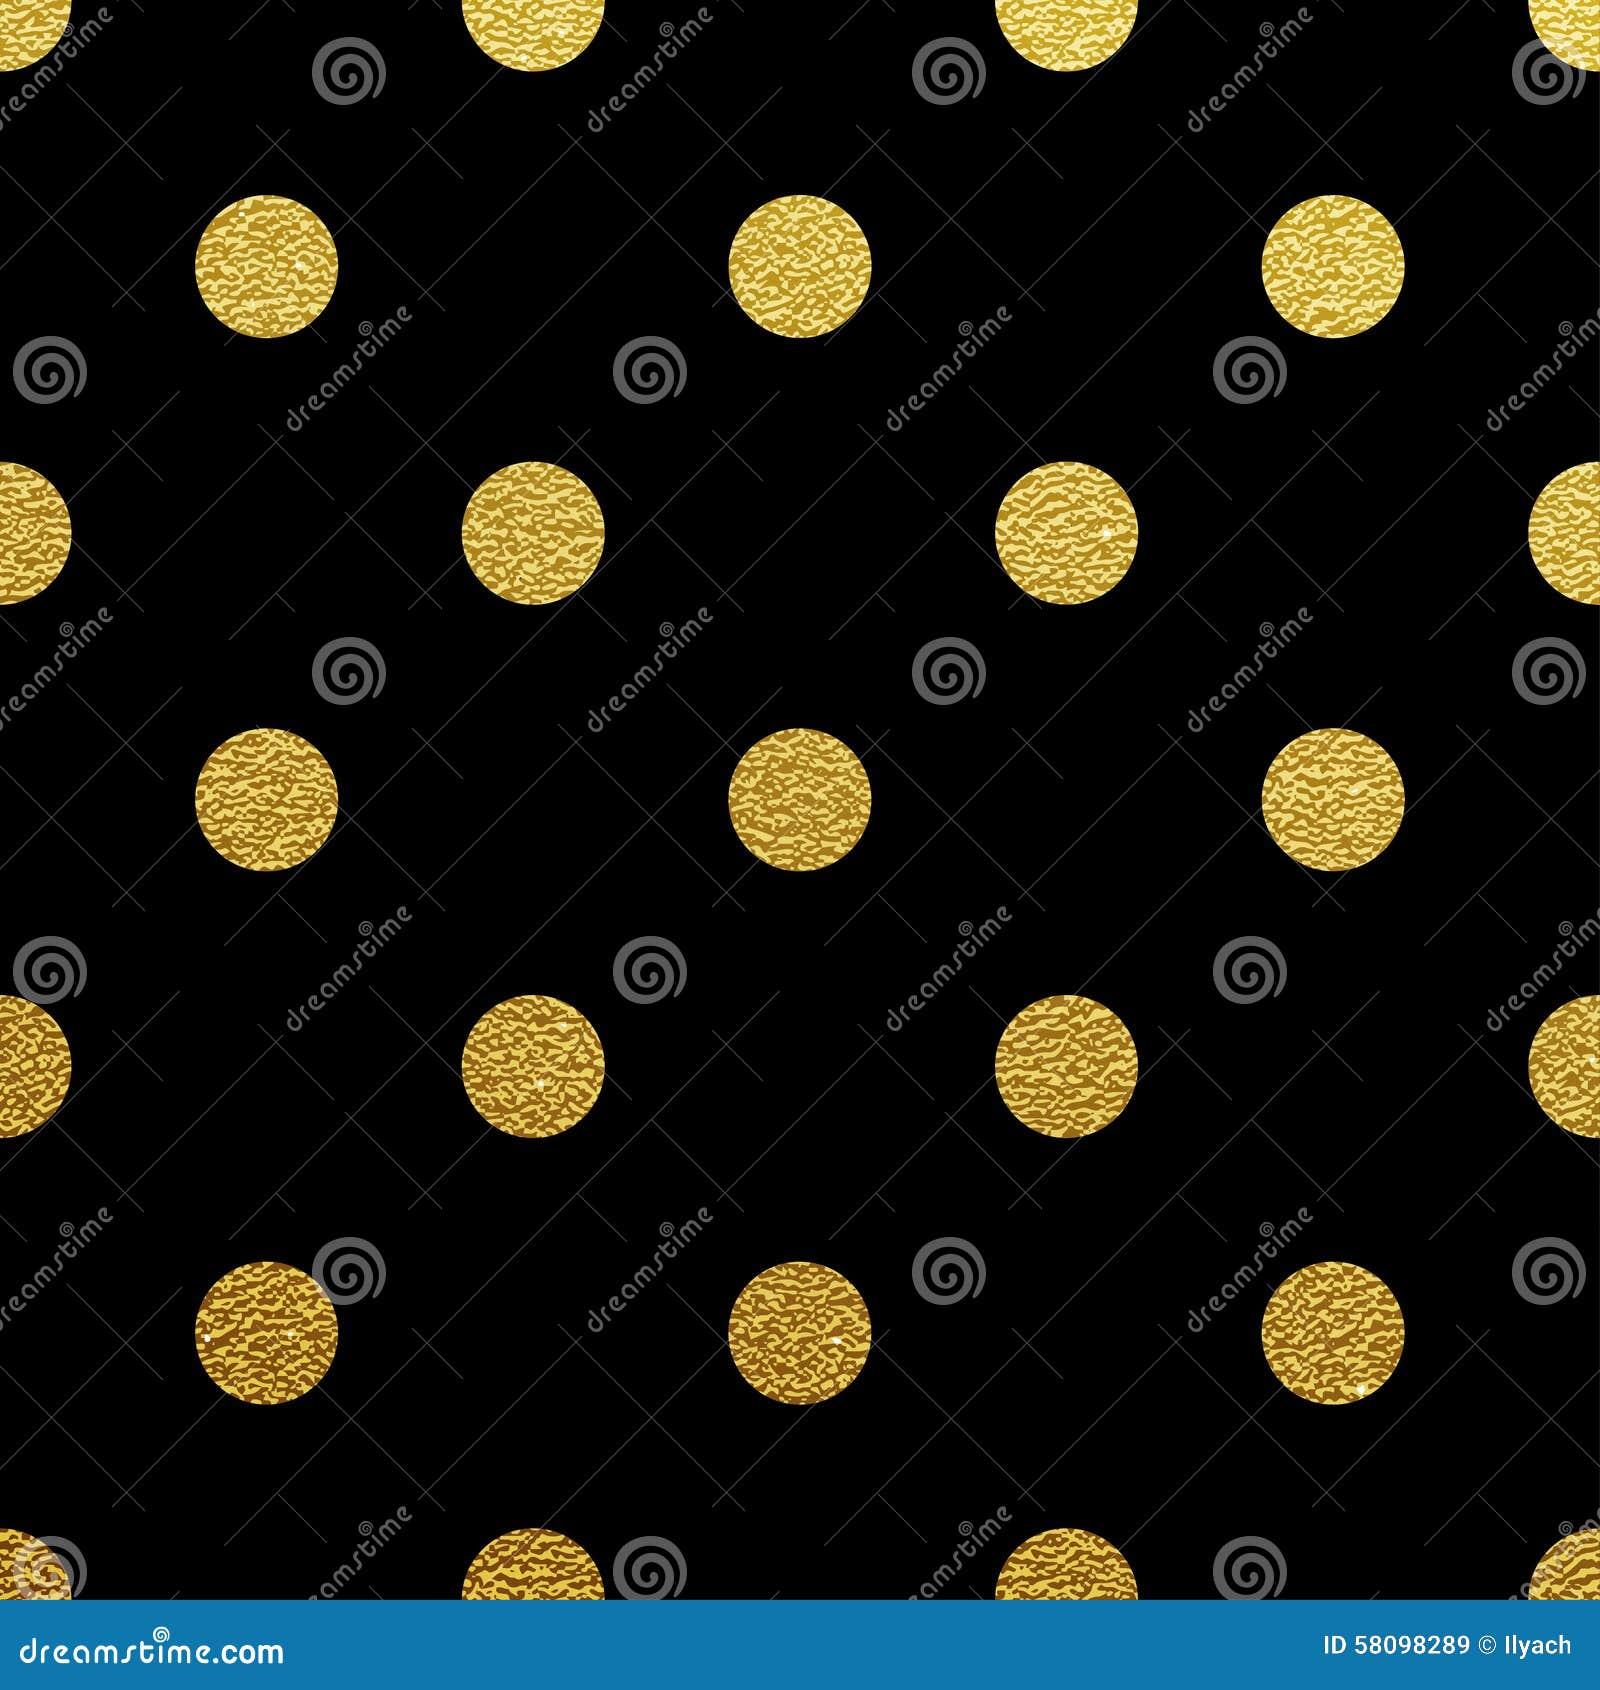 Gold Polka Dot Seamless Pattern On Black Background Stock Vector ...